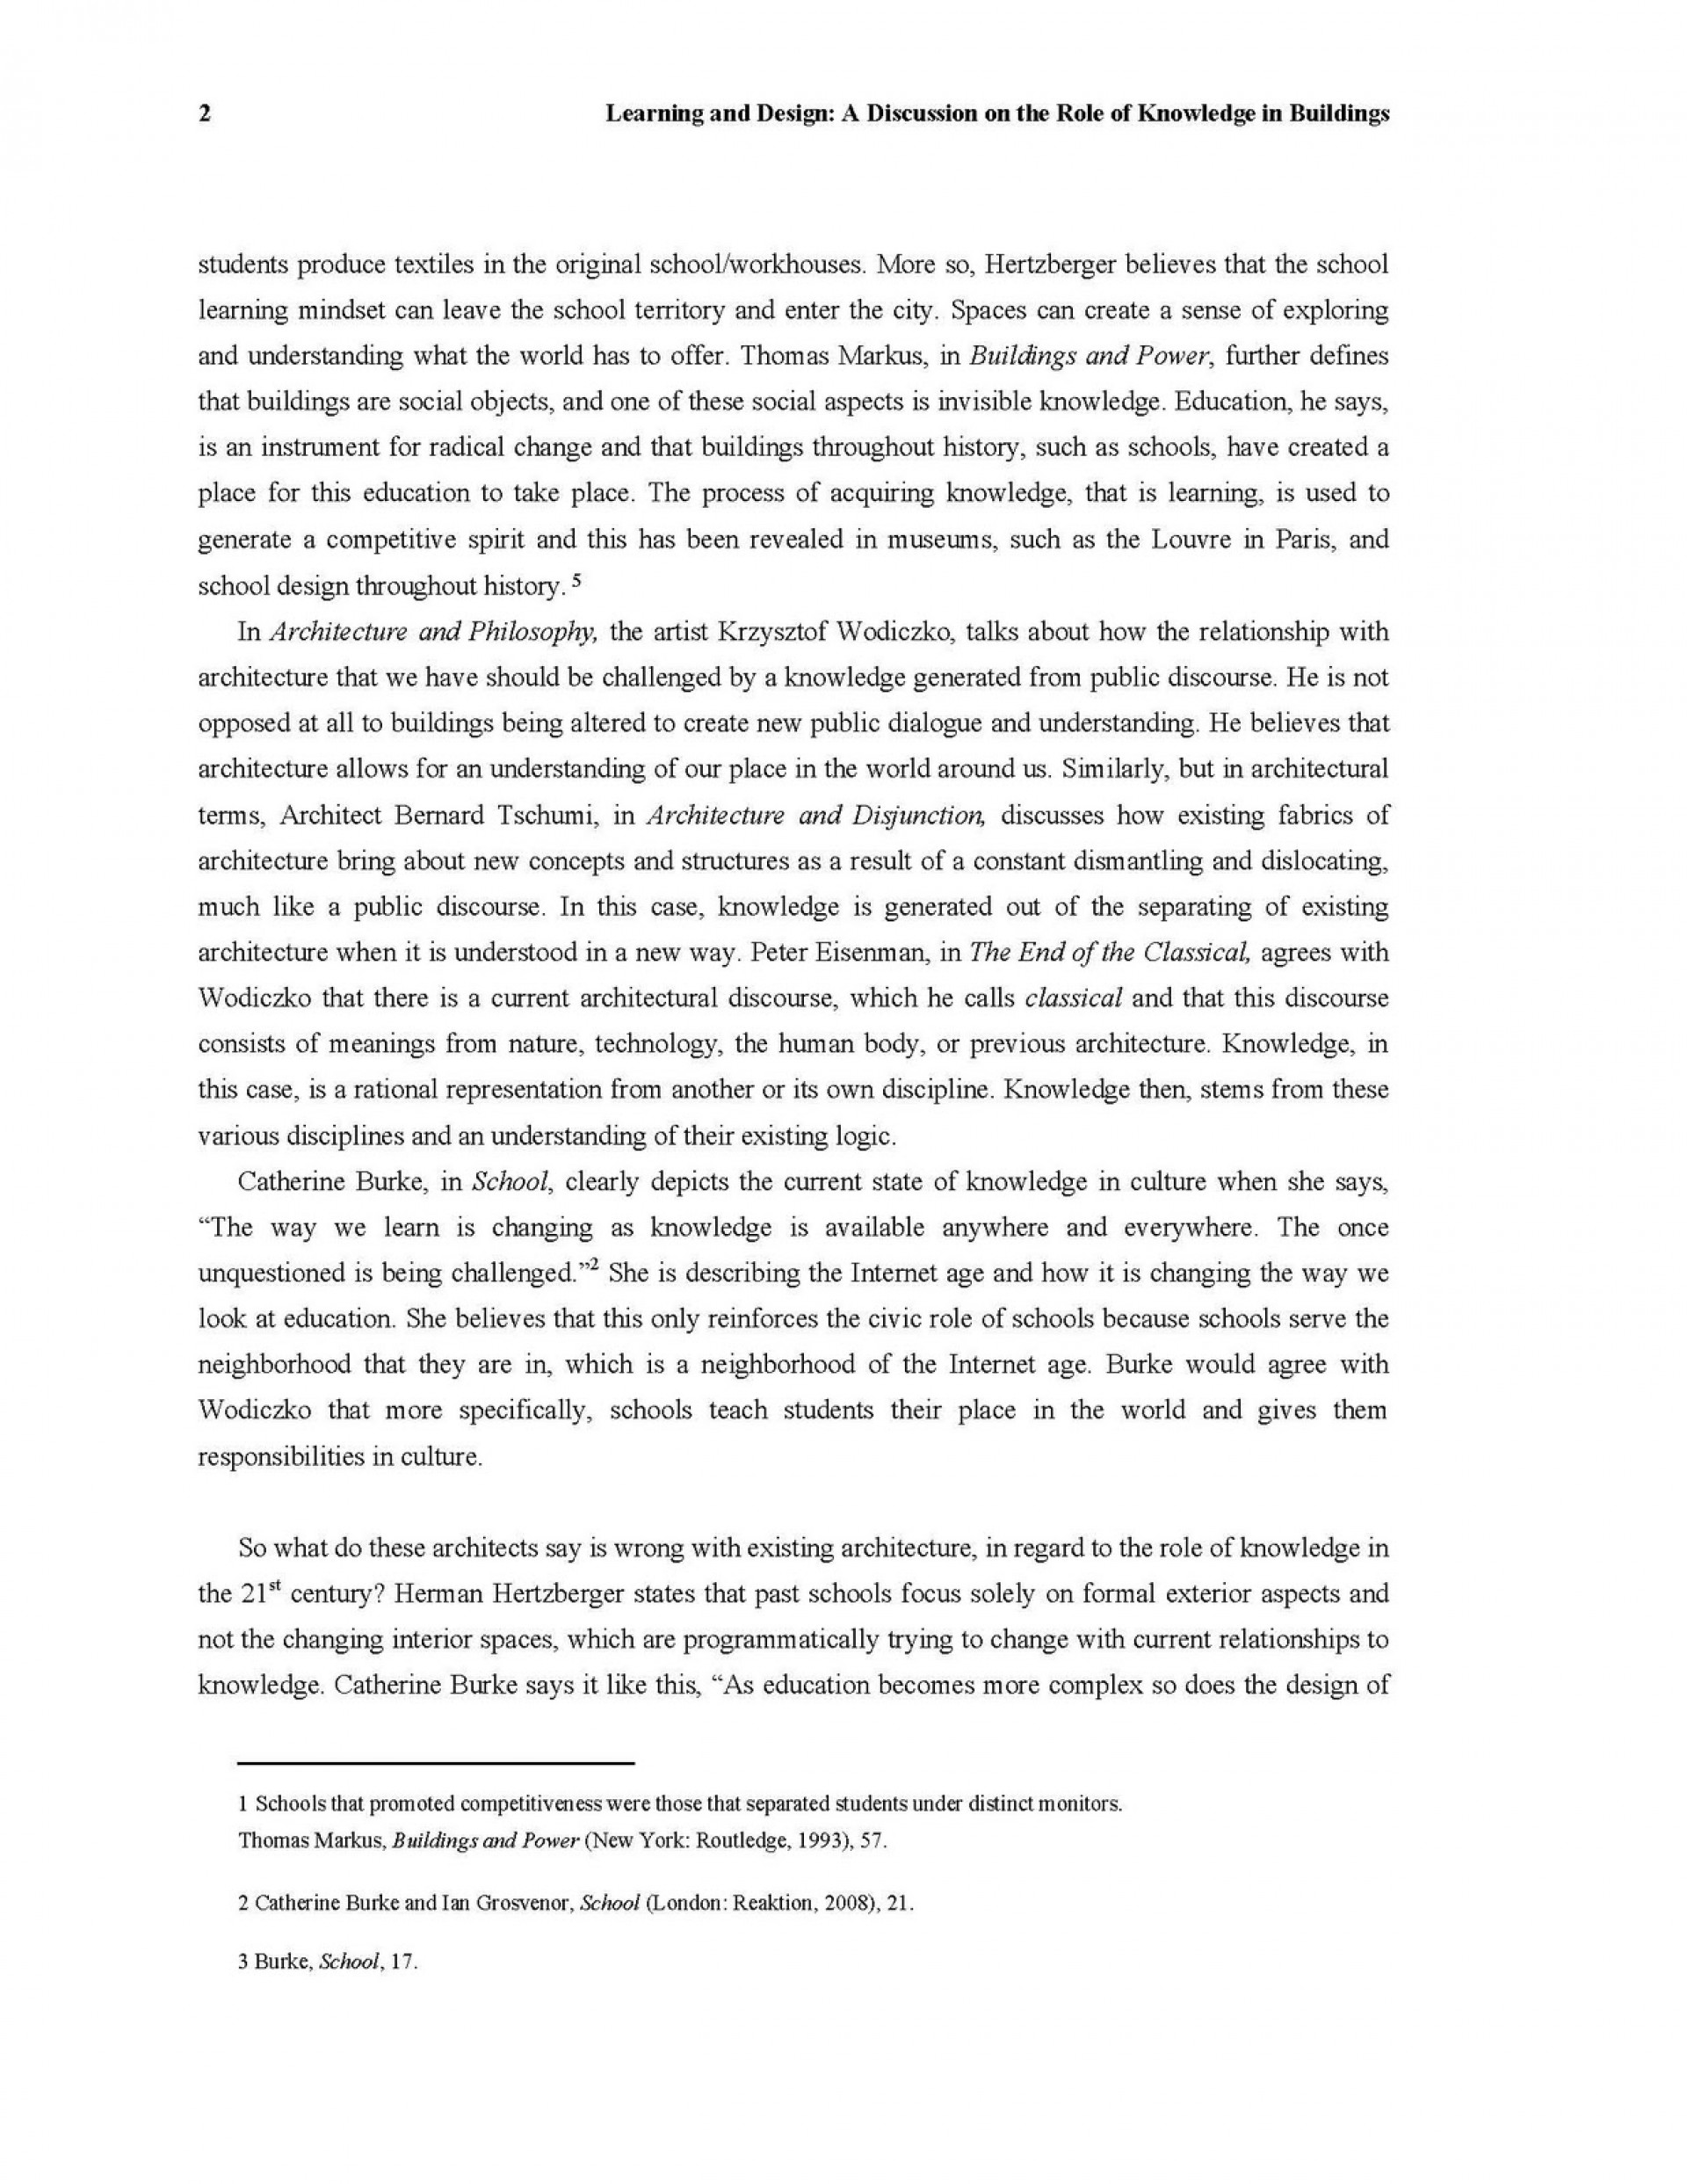 006 Bibliographic Essay Bibliogahhicessay Page 2 Wondrous Example Mla Outline 1920